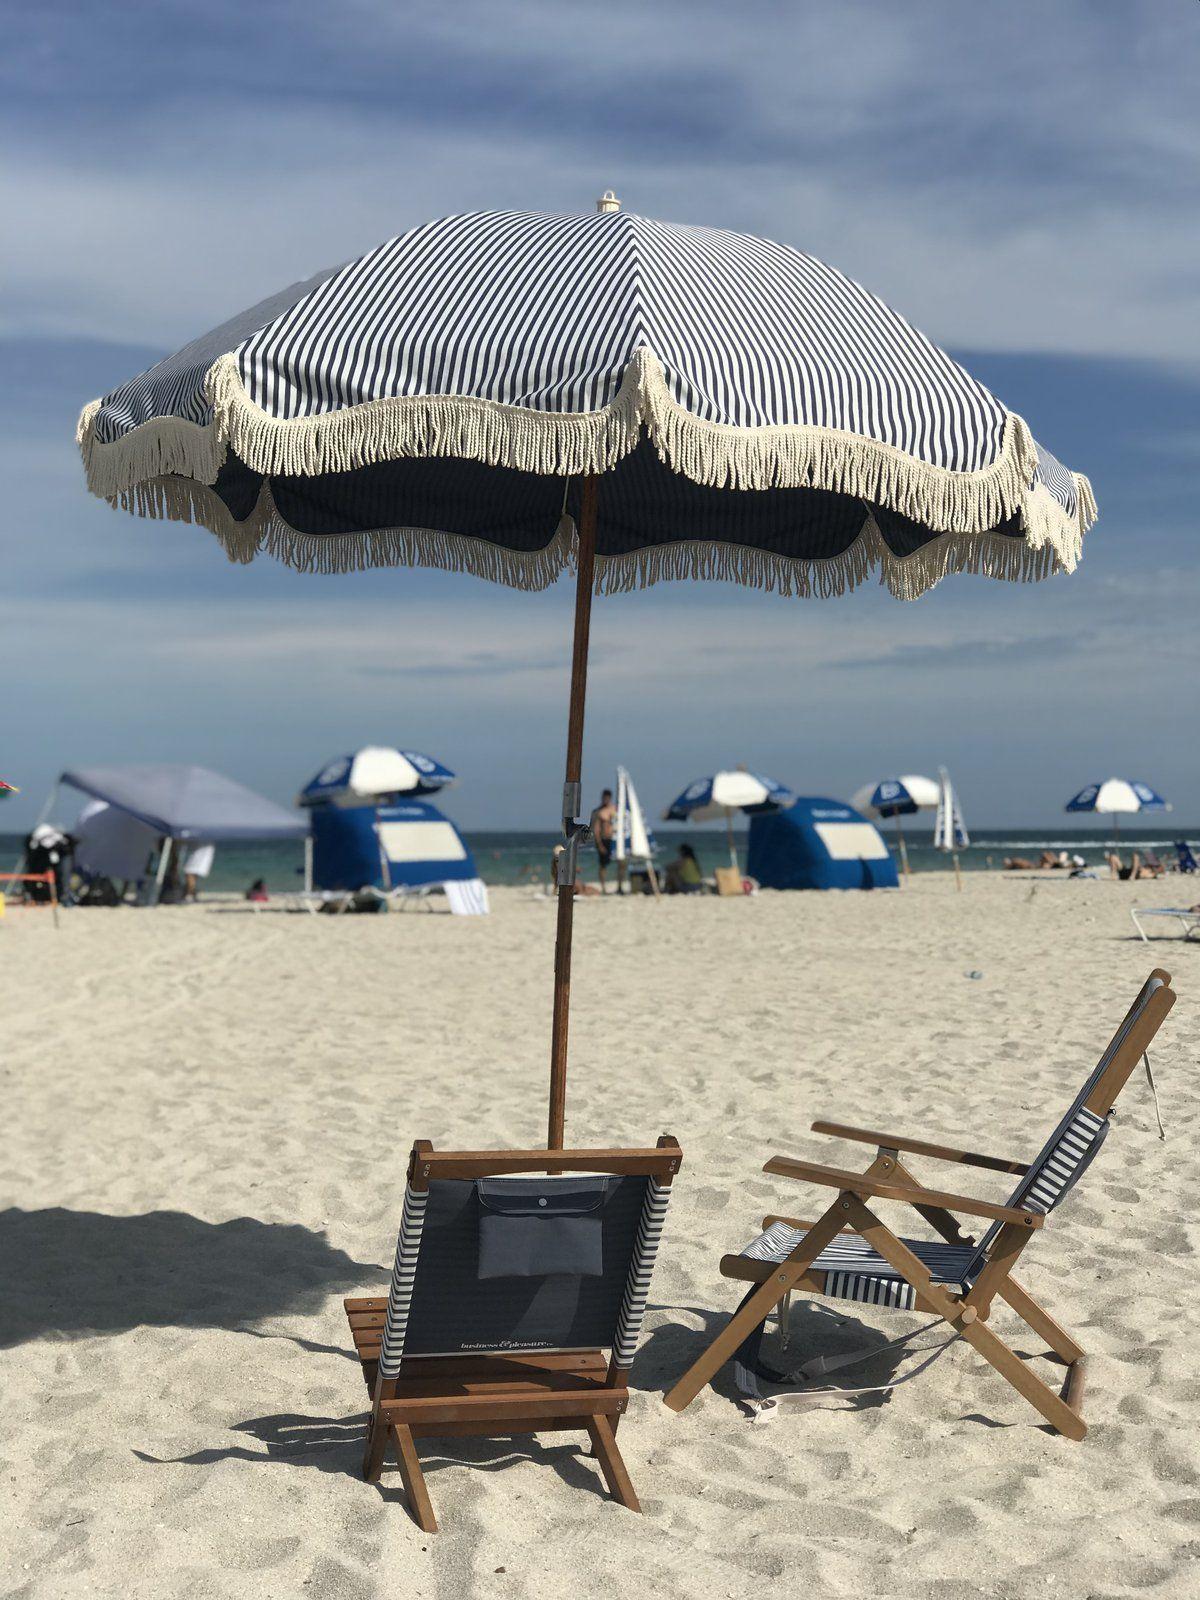 The Premium Beach Umbrella Lauren S Navy Stripe Beach Umbrella Patio Patio Umbrellas